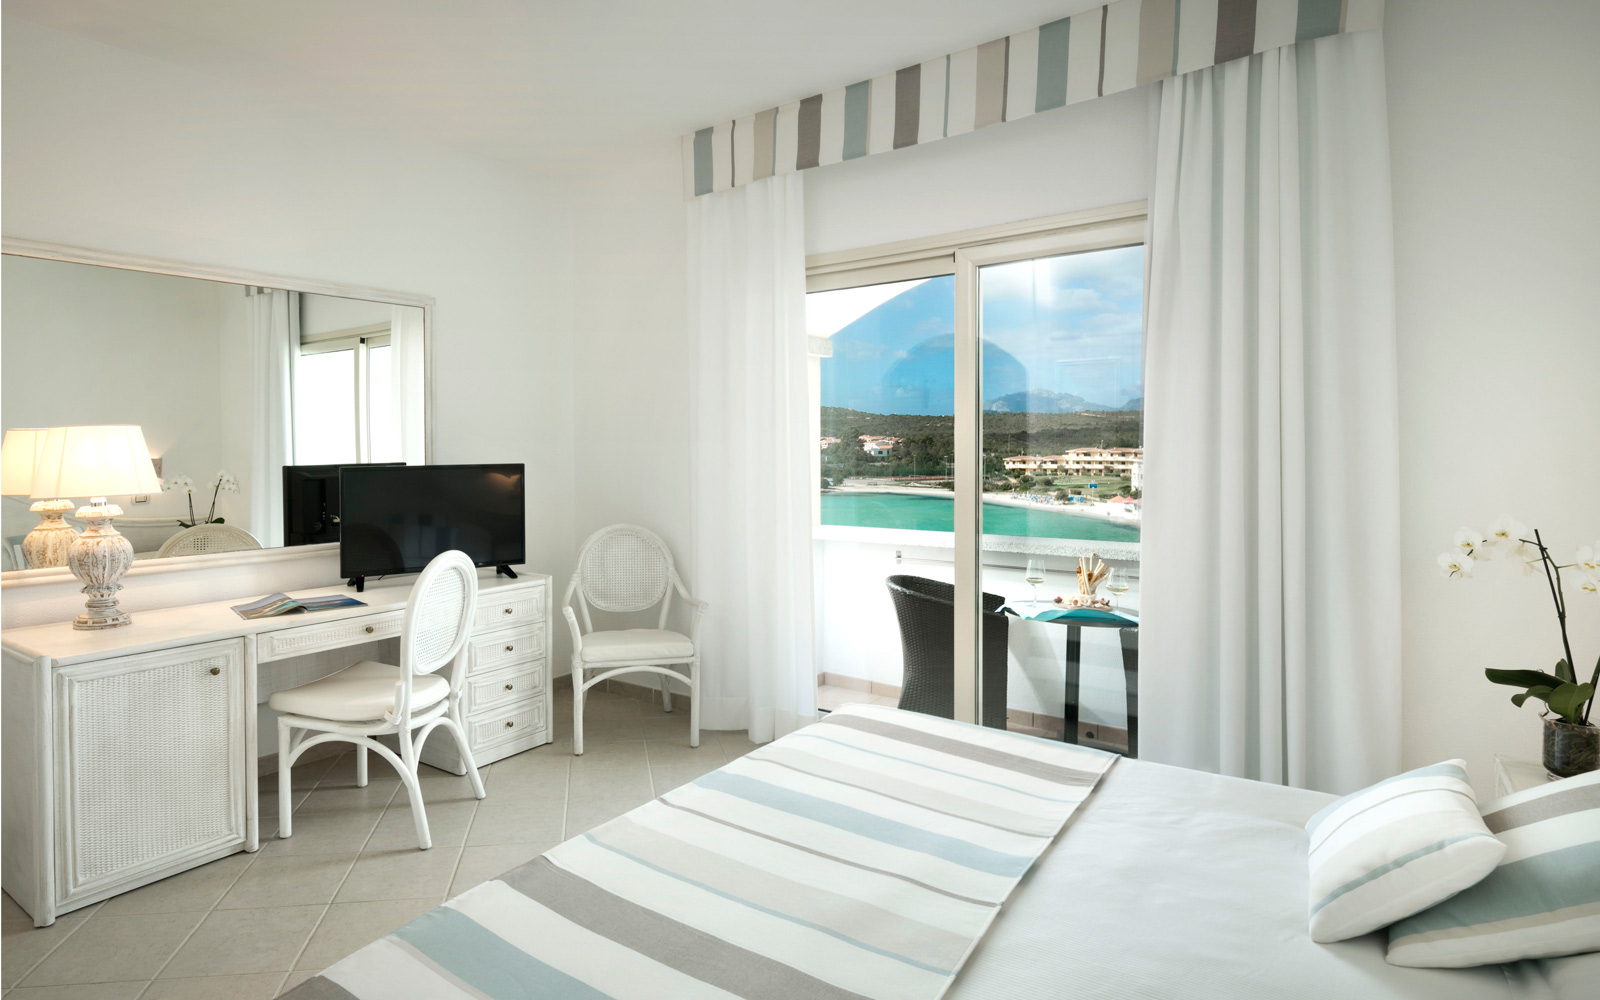 Superior Room at Gabbiano Azzurro Hotel & Suites